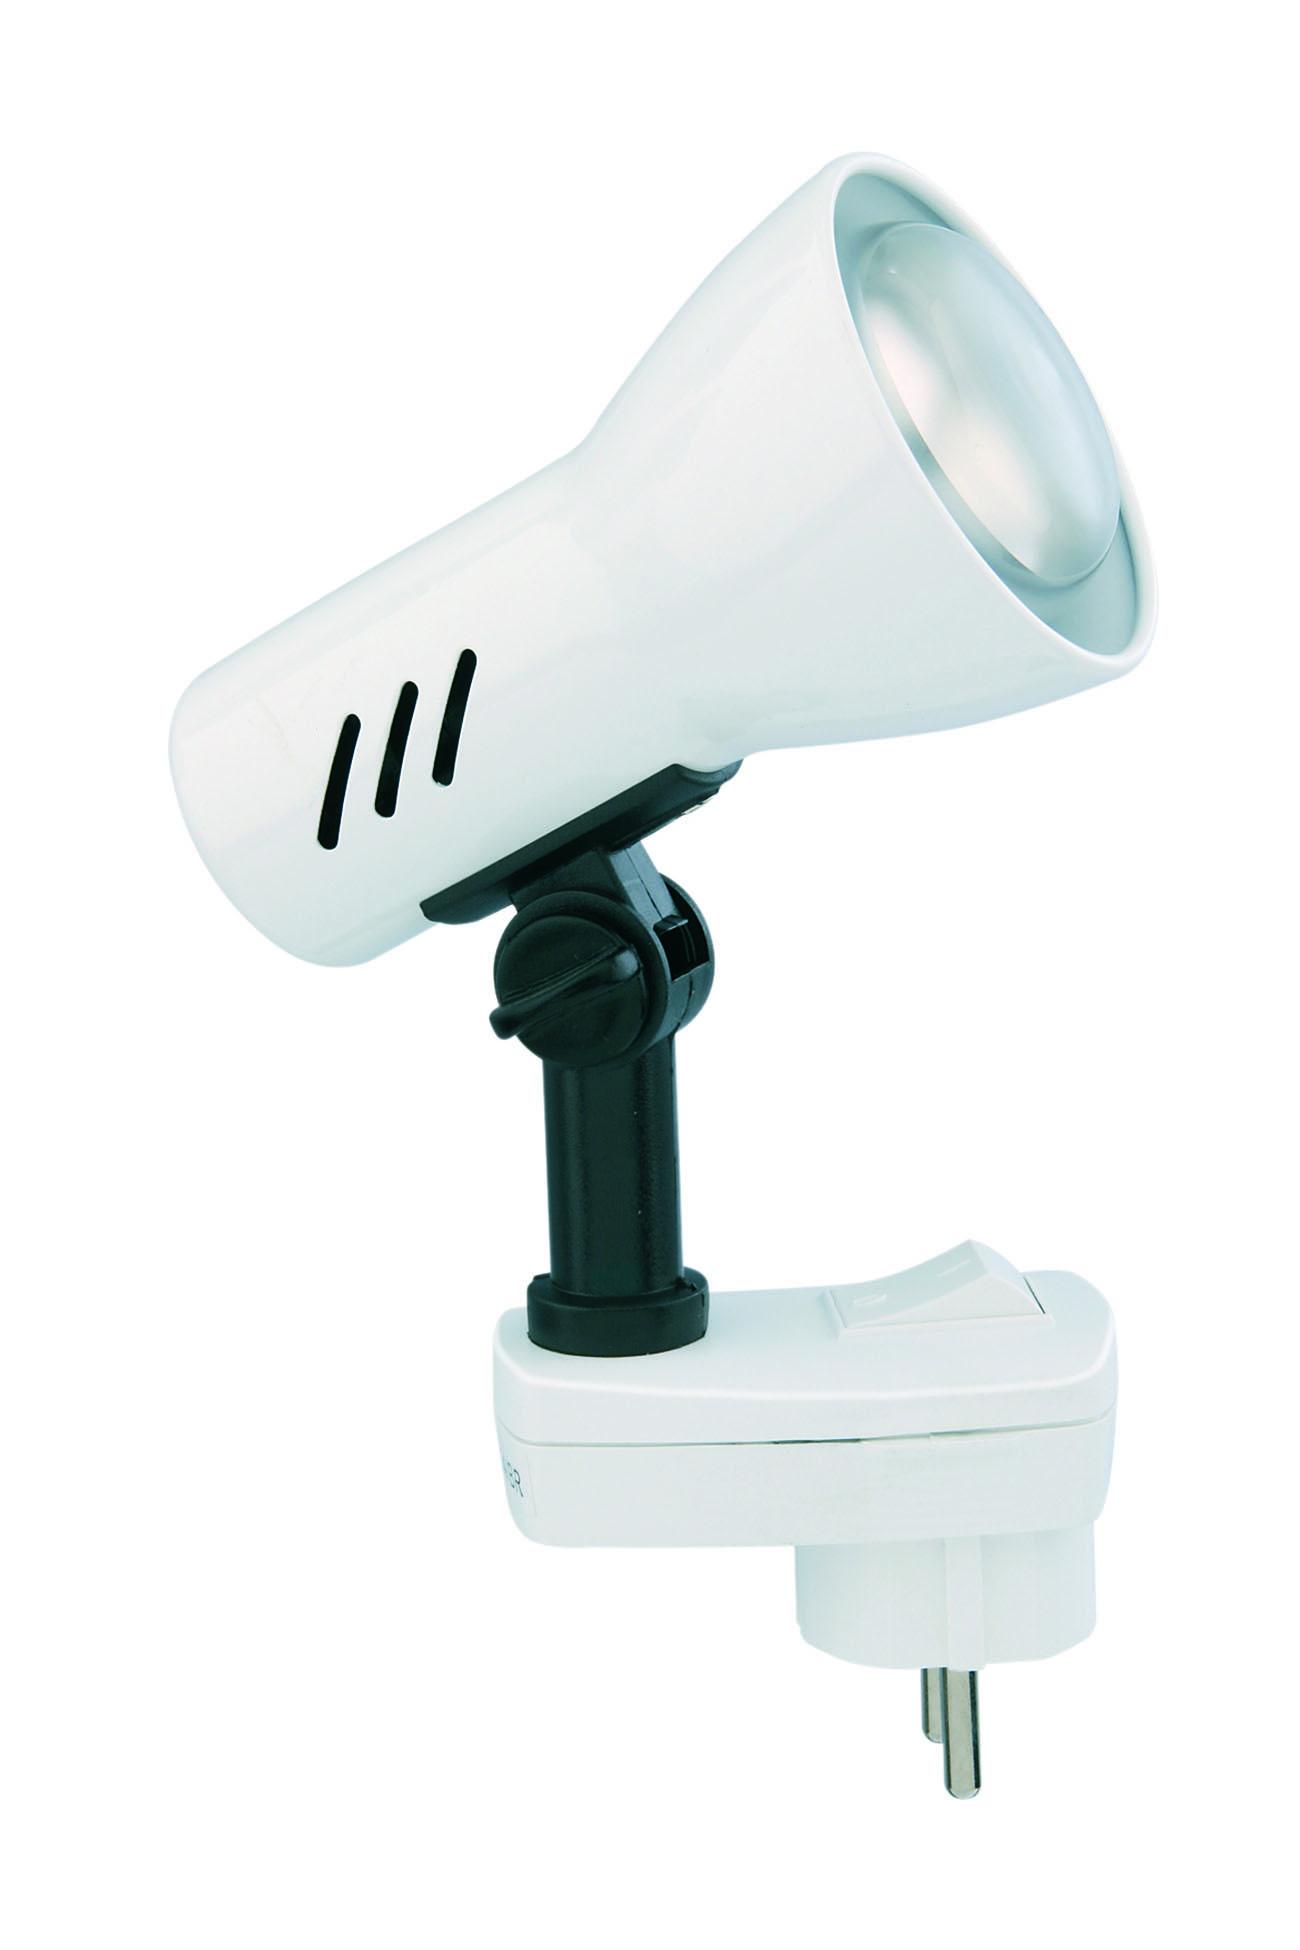 LED Steckerleuchte, 11,5 cm, max. 25 W, Weiss